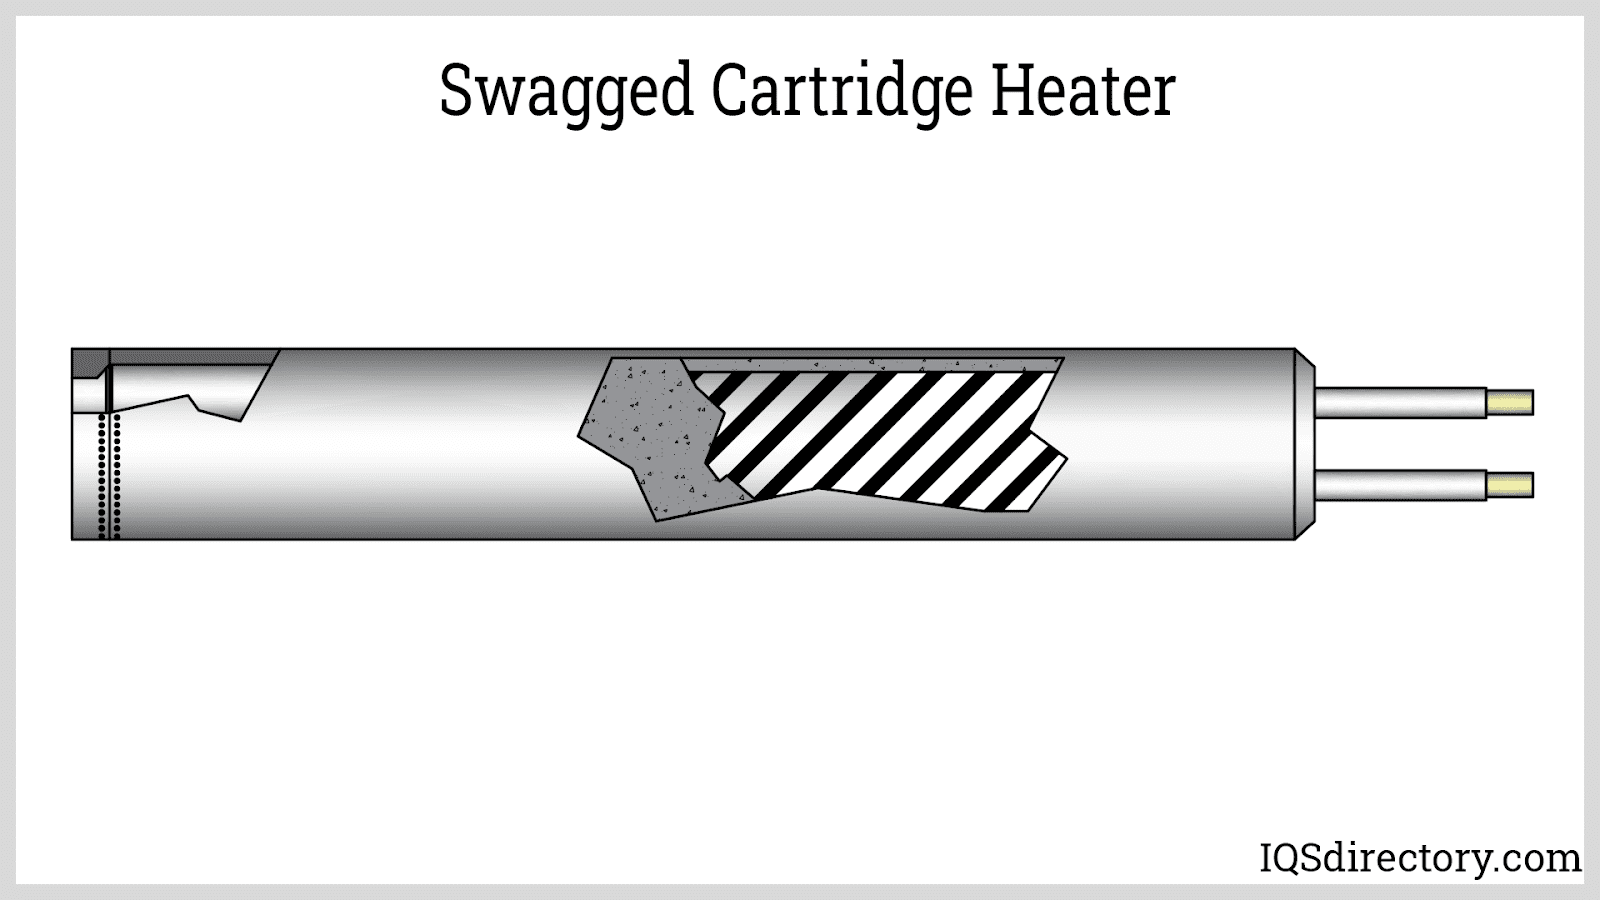 Swagged Cartridge Heater